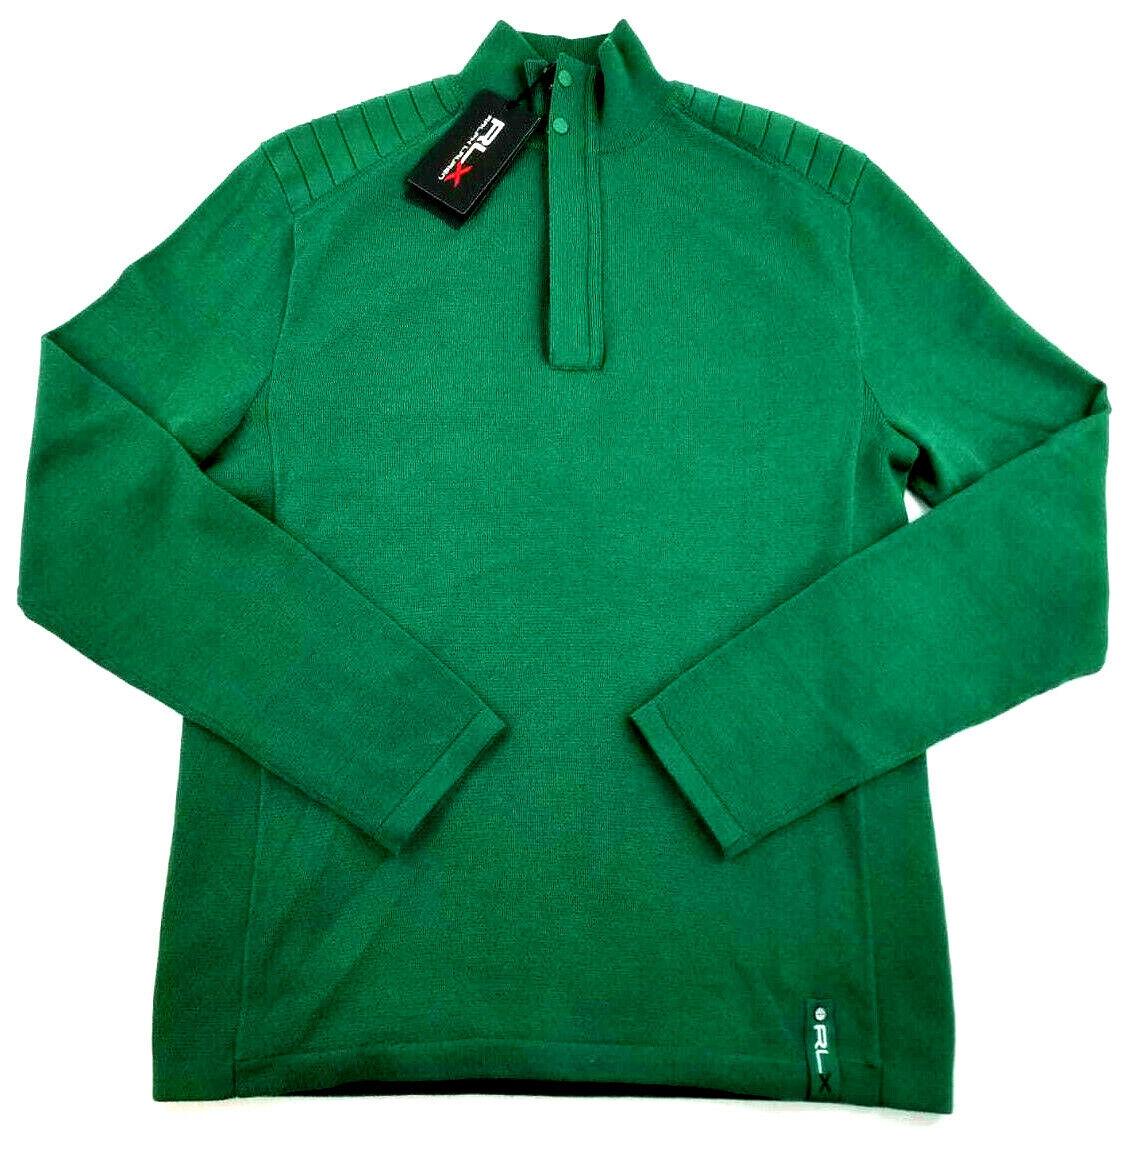 Nuovo Ralph Lauren Rlx Uomo Giacca Top Maglione 785685985001 Sp18 verde S